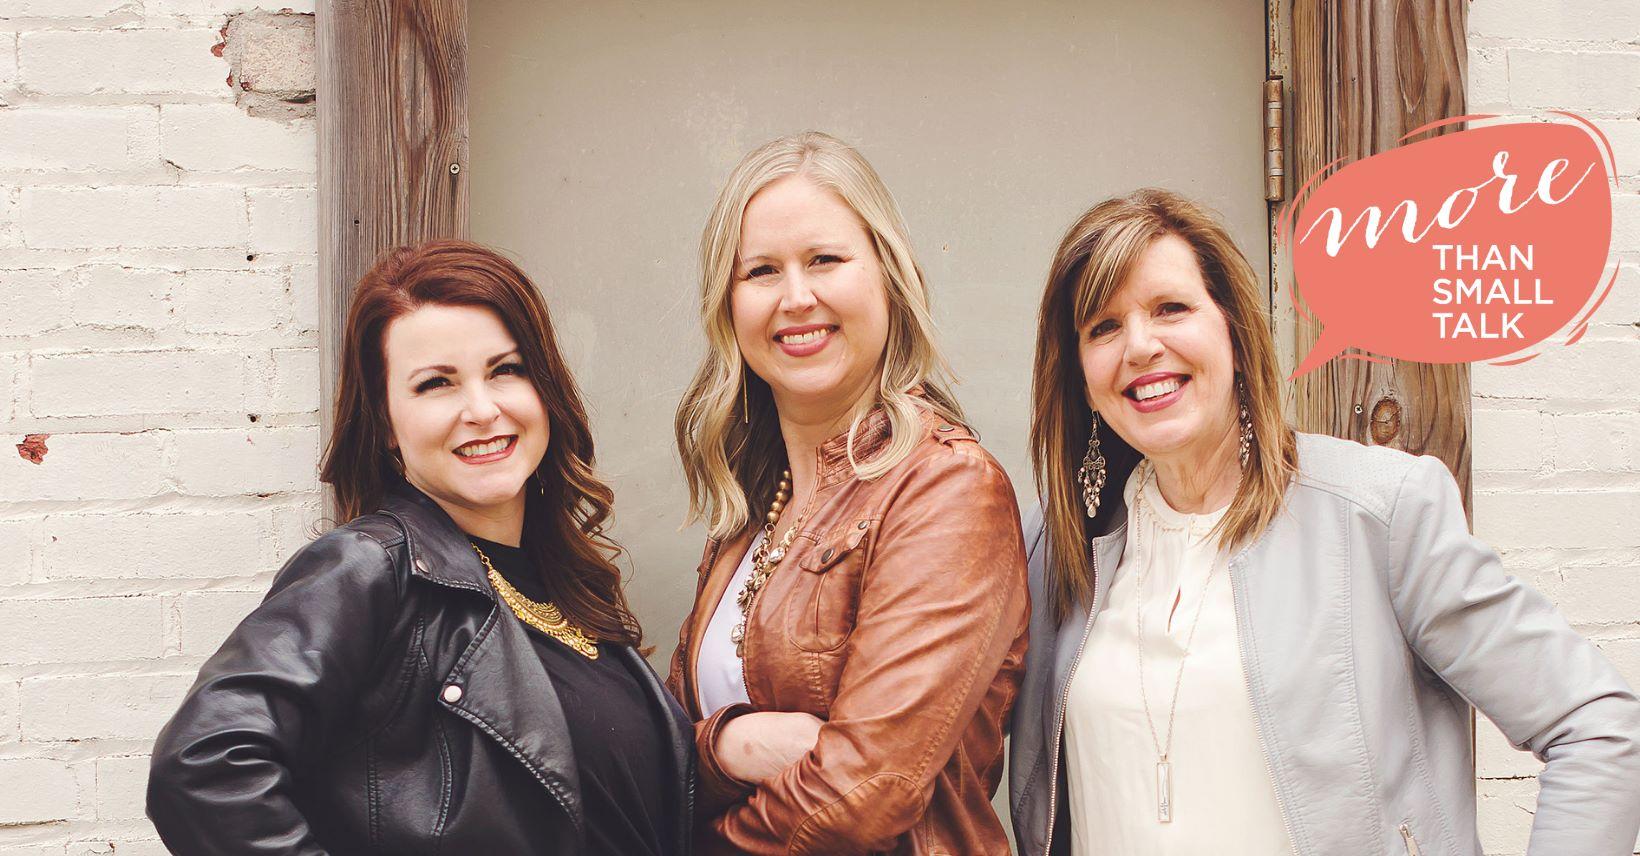 Holley, Suzie and Jennifer